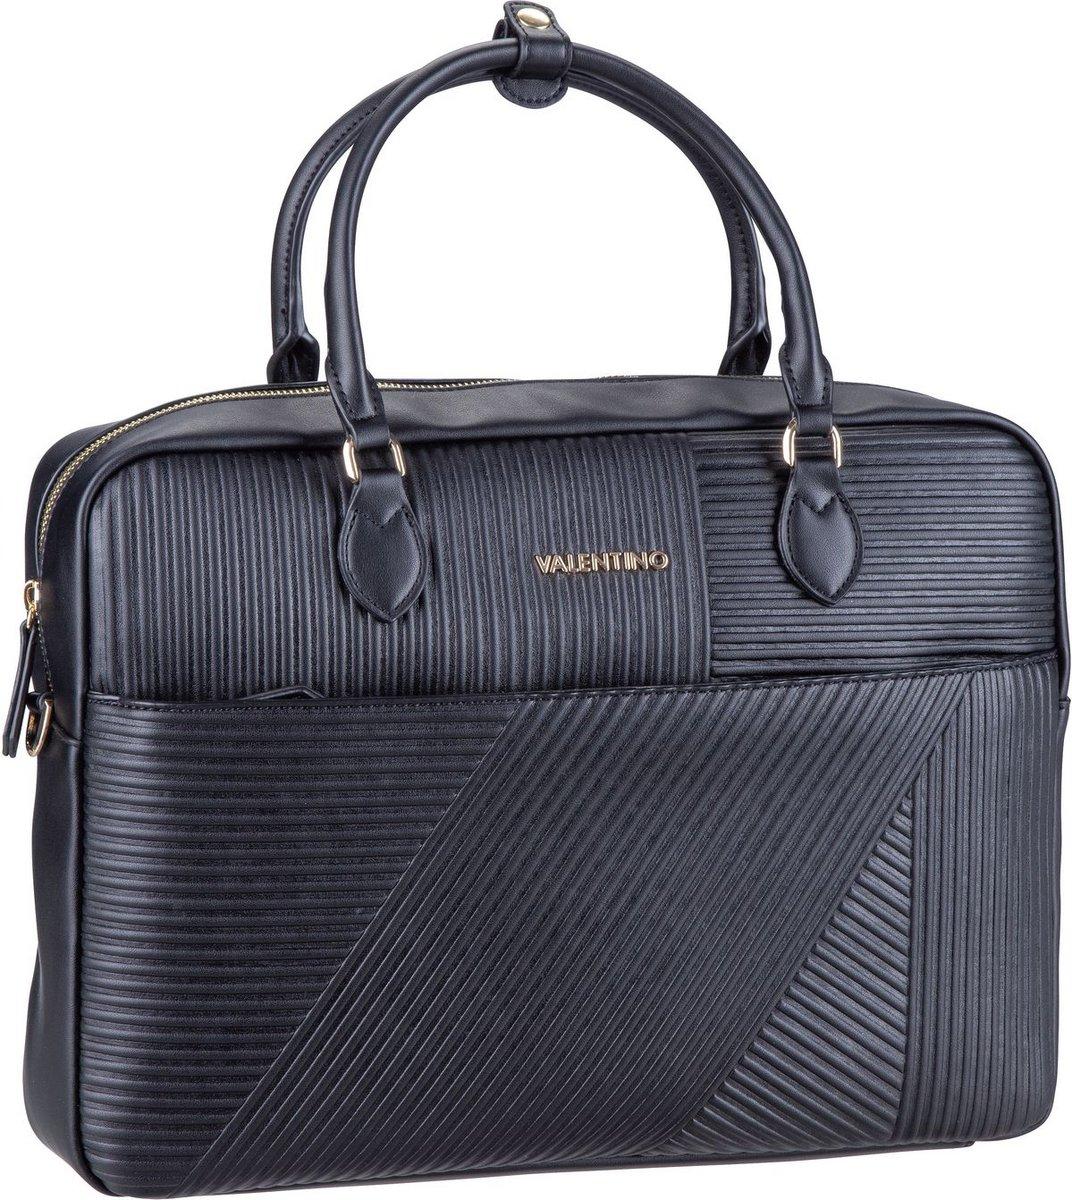 valentino bags -  Aktentasche Plane Laptop Bag G03 Nero (10.4 Liter)